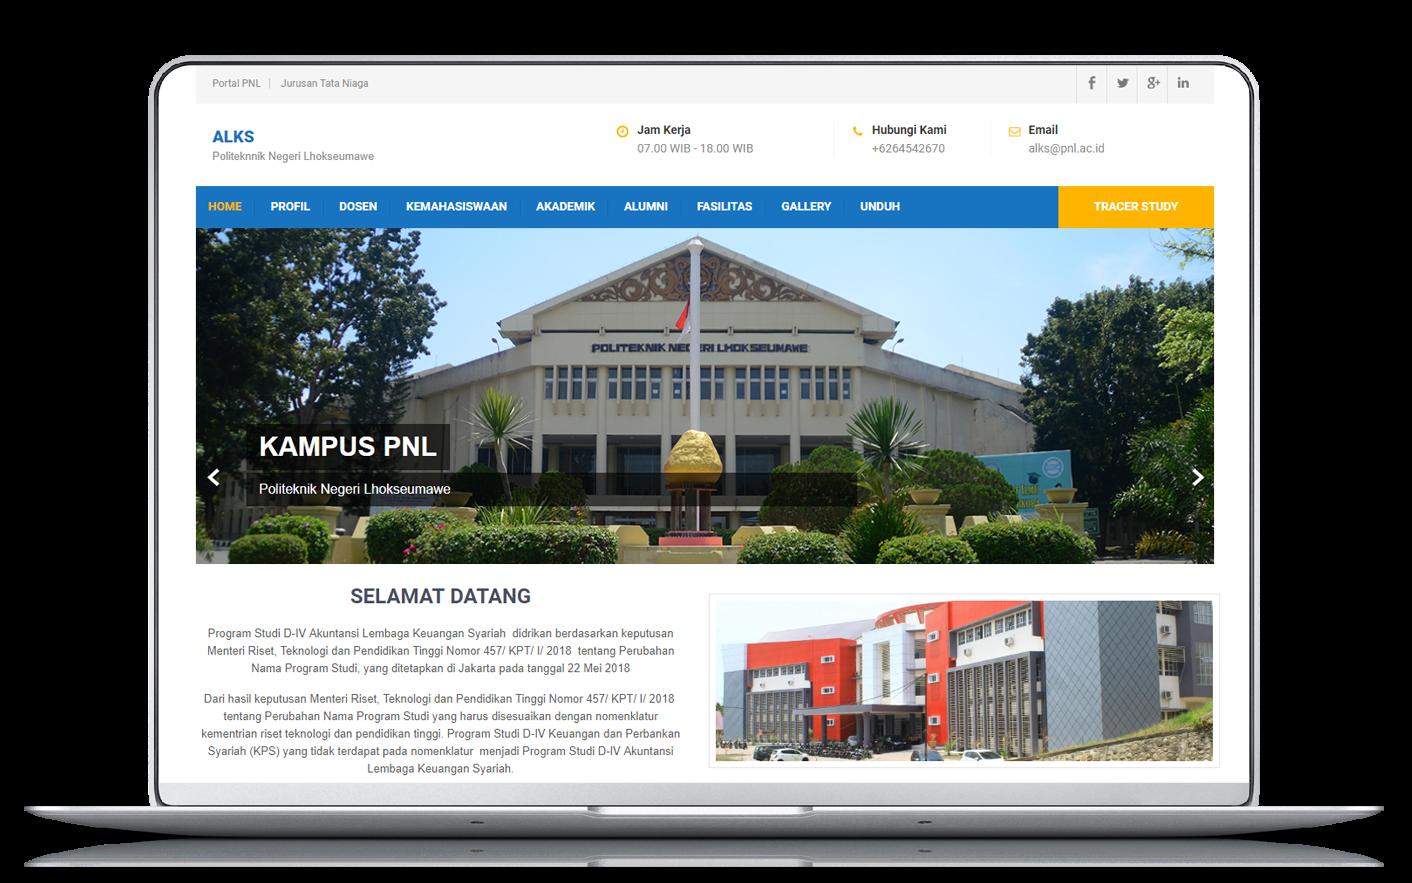 Jasa Pembuatan Website - www.indohost.id